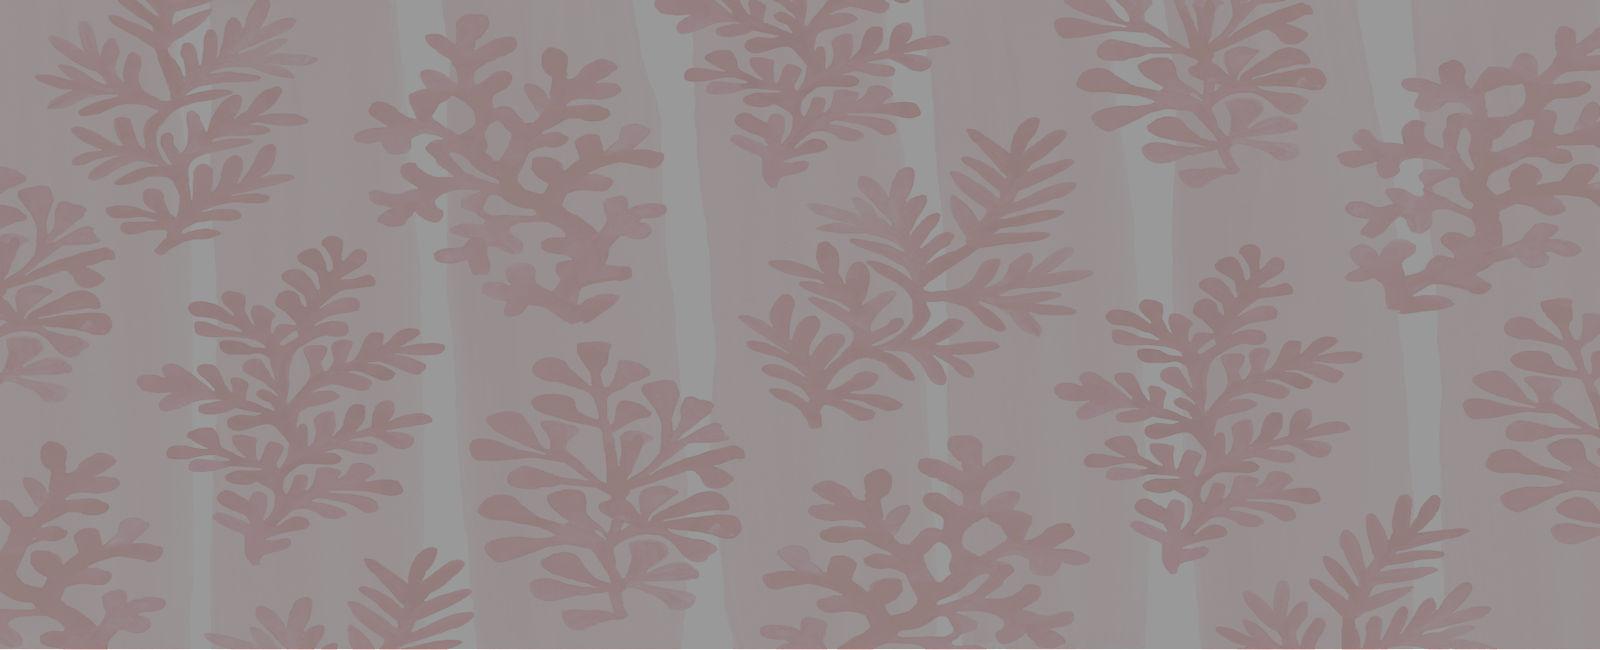 coral-background.jpg